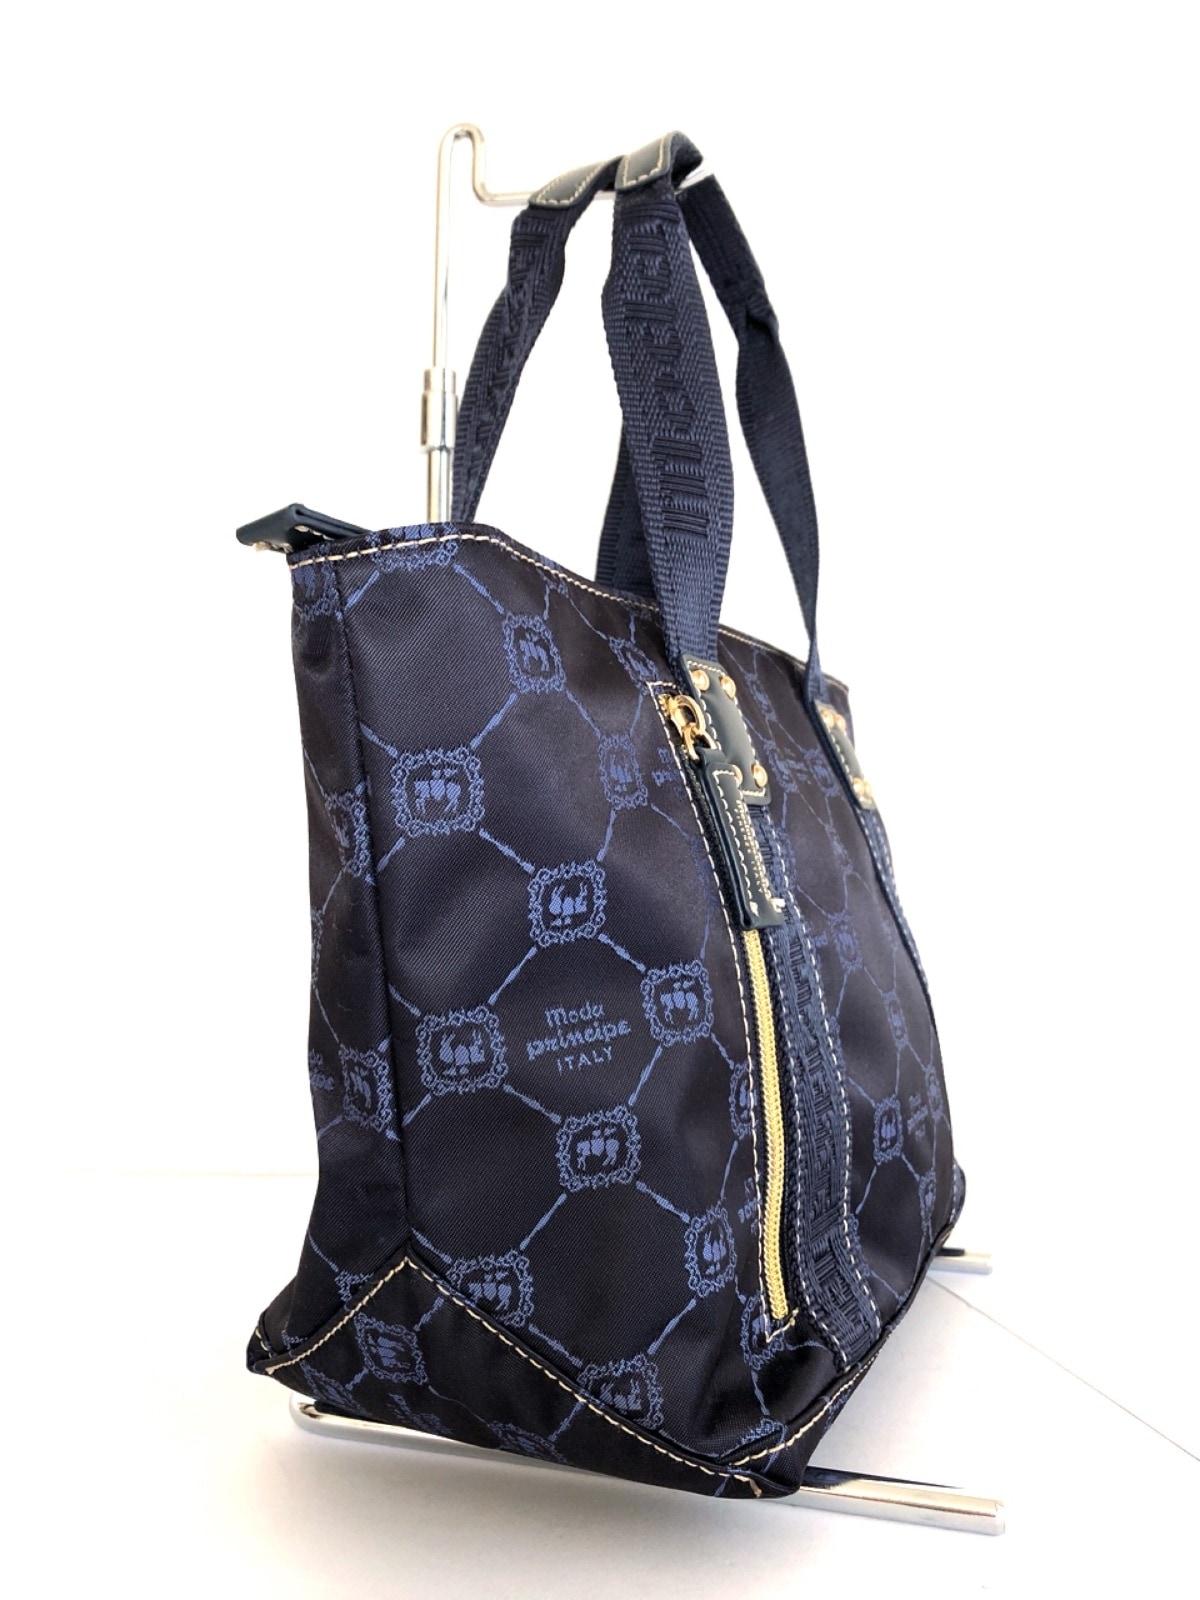 modaprincipe(モーダプリンチペ)のハンドバッグ